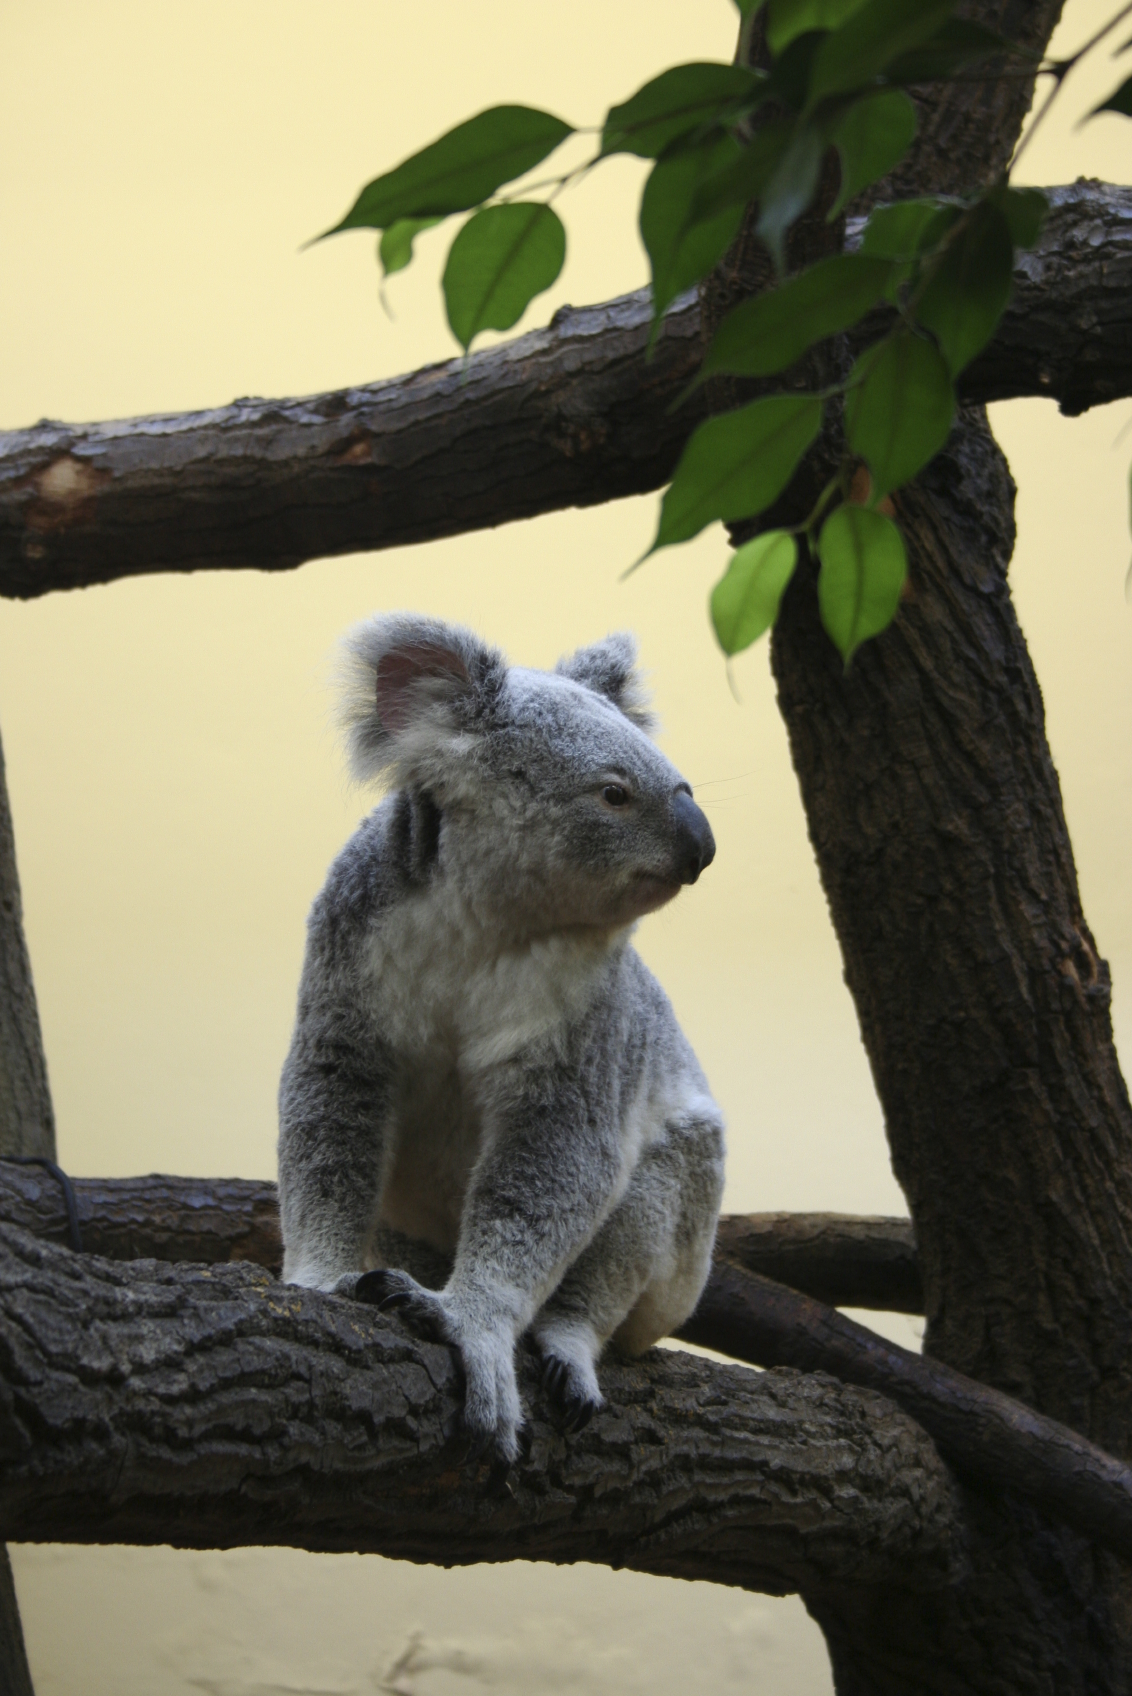 Slow Down! It's Koala Breeding Season | ANIMAL VOGUE